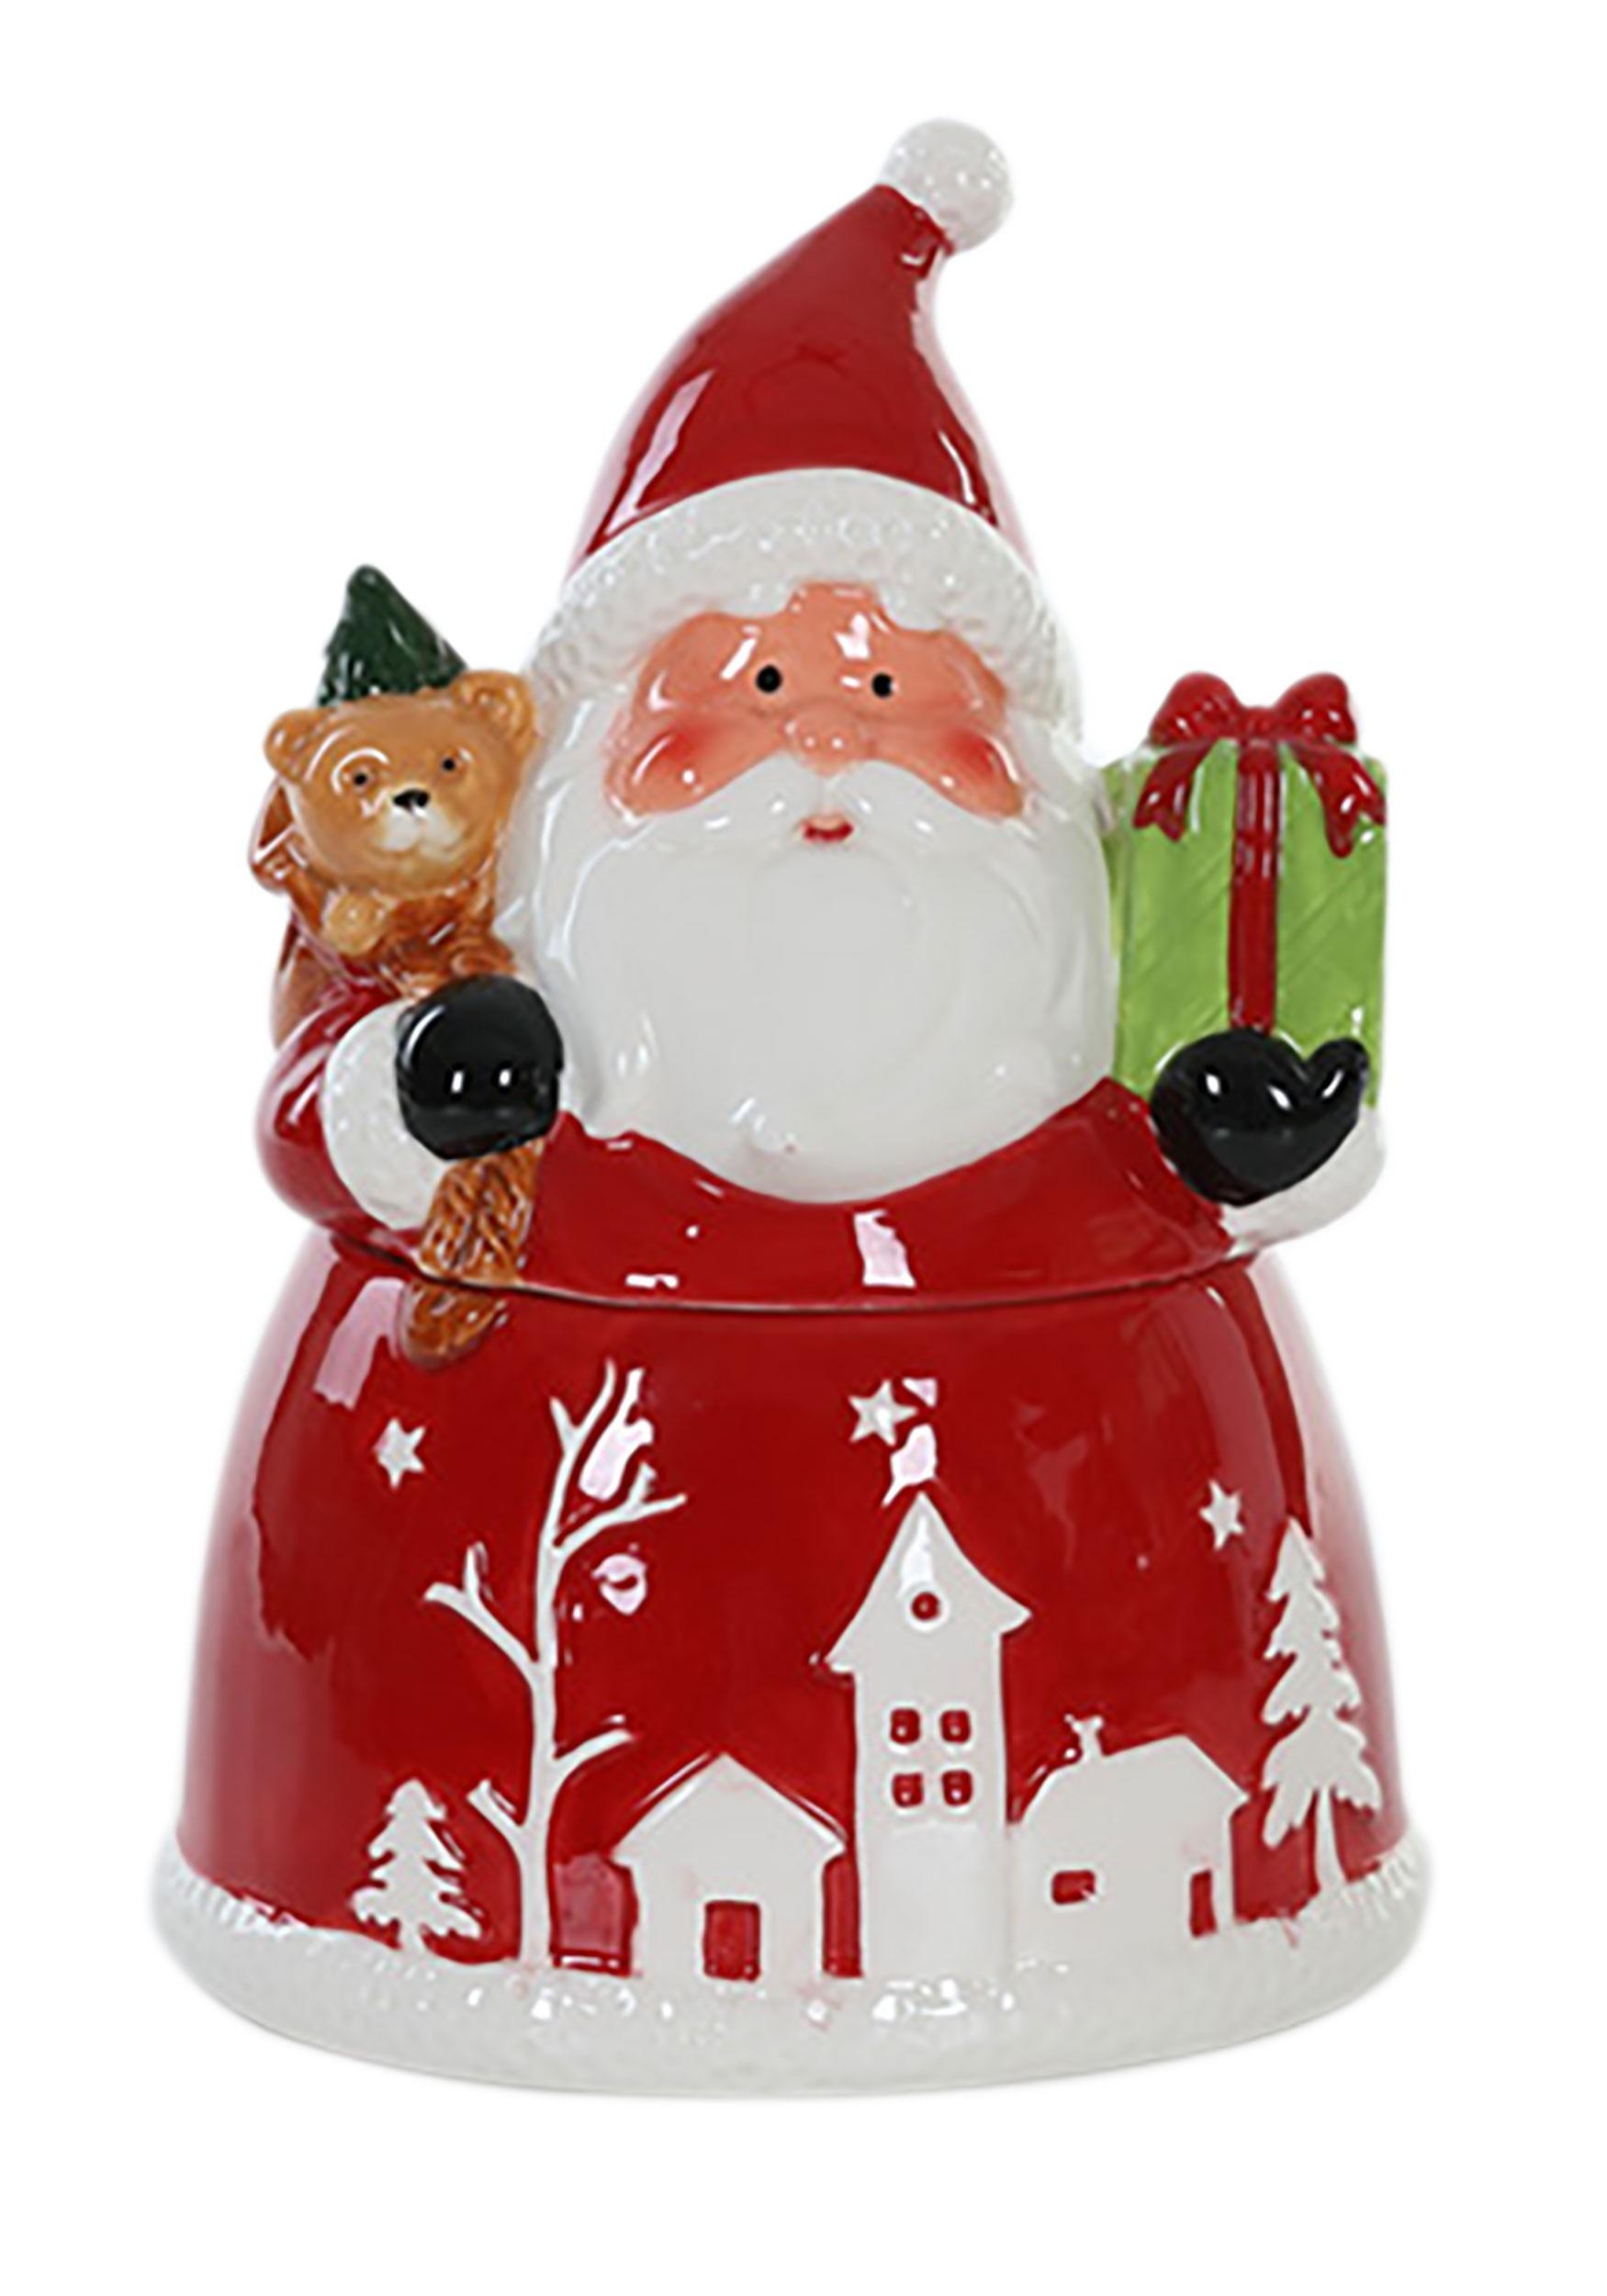 Santa Christmas Ceramic Cookie Jar